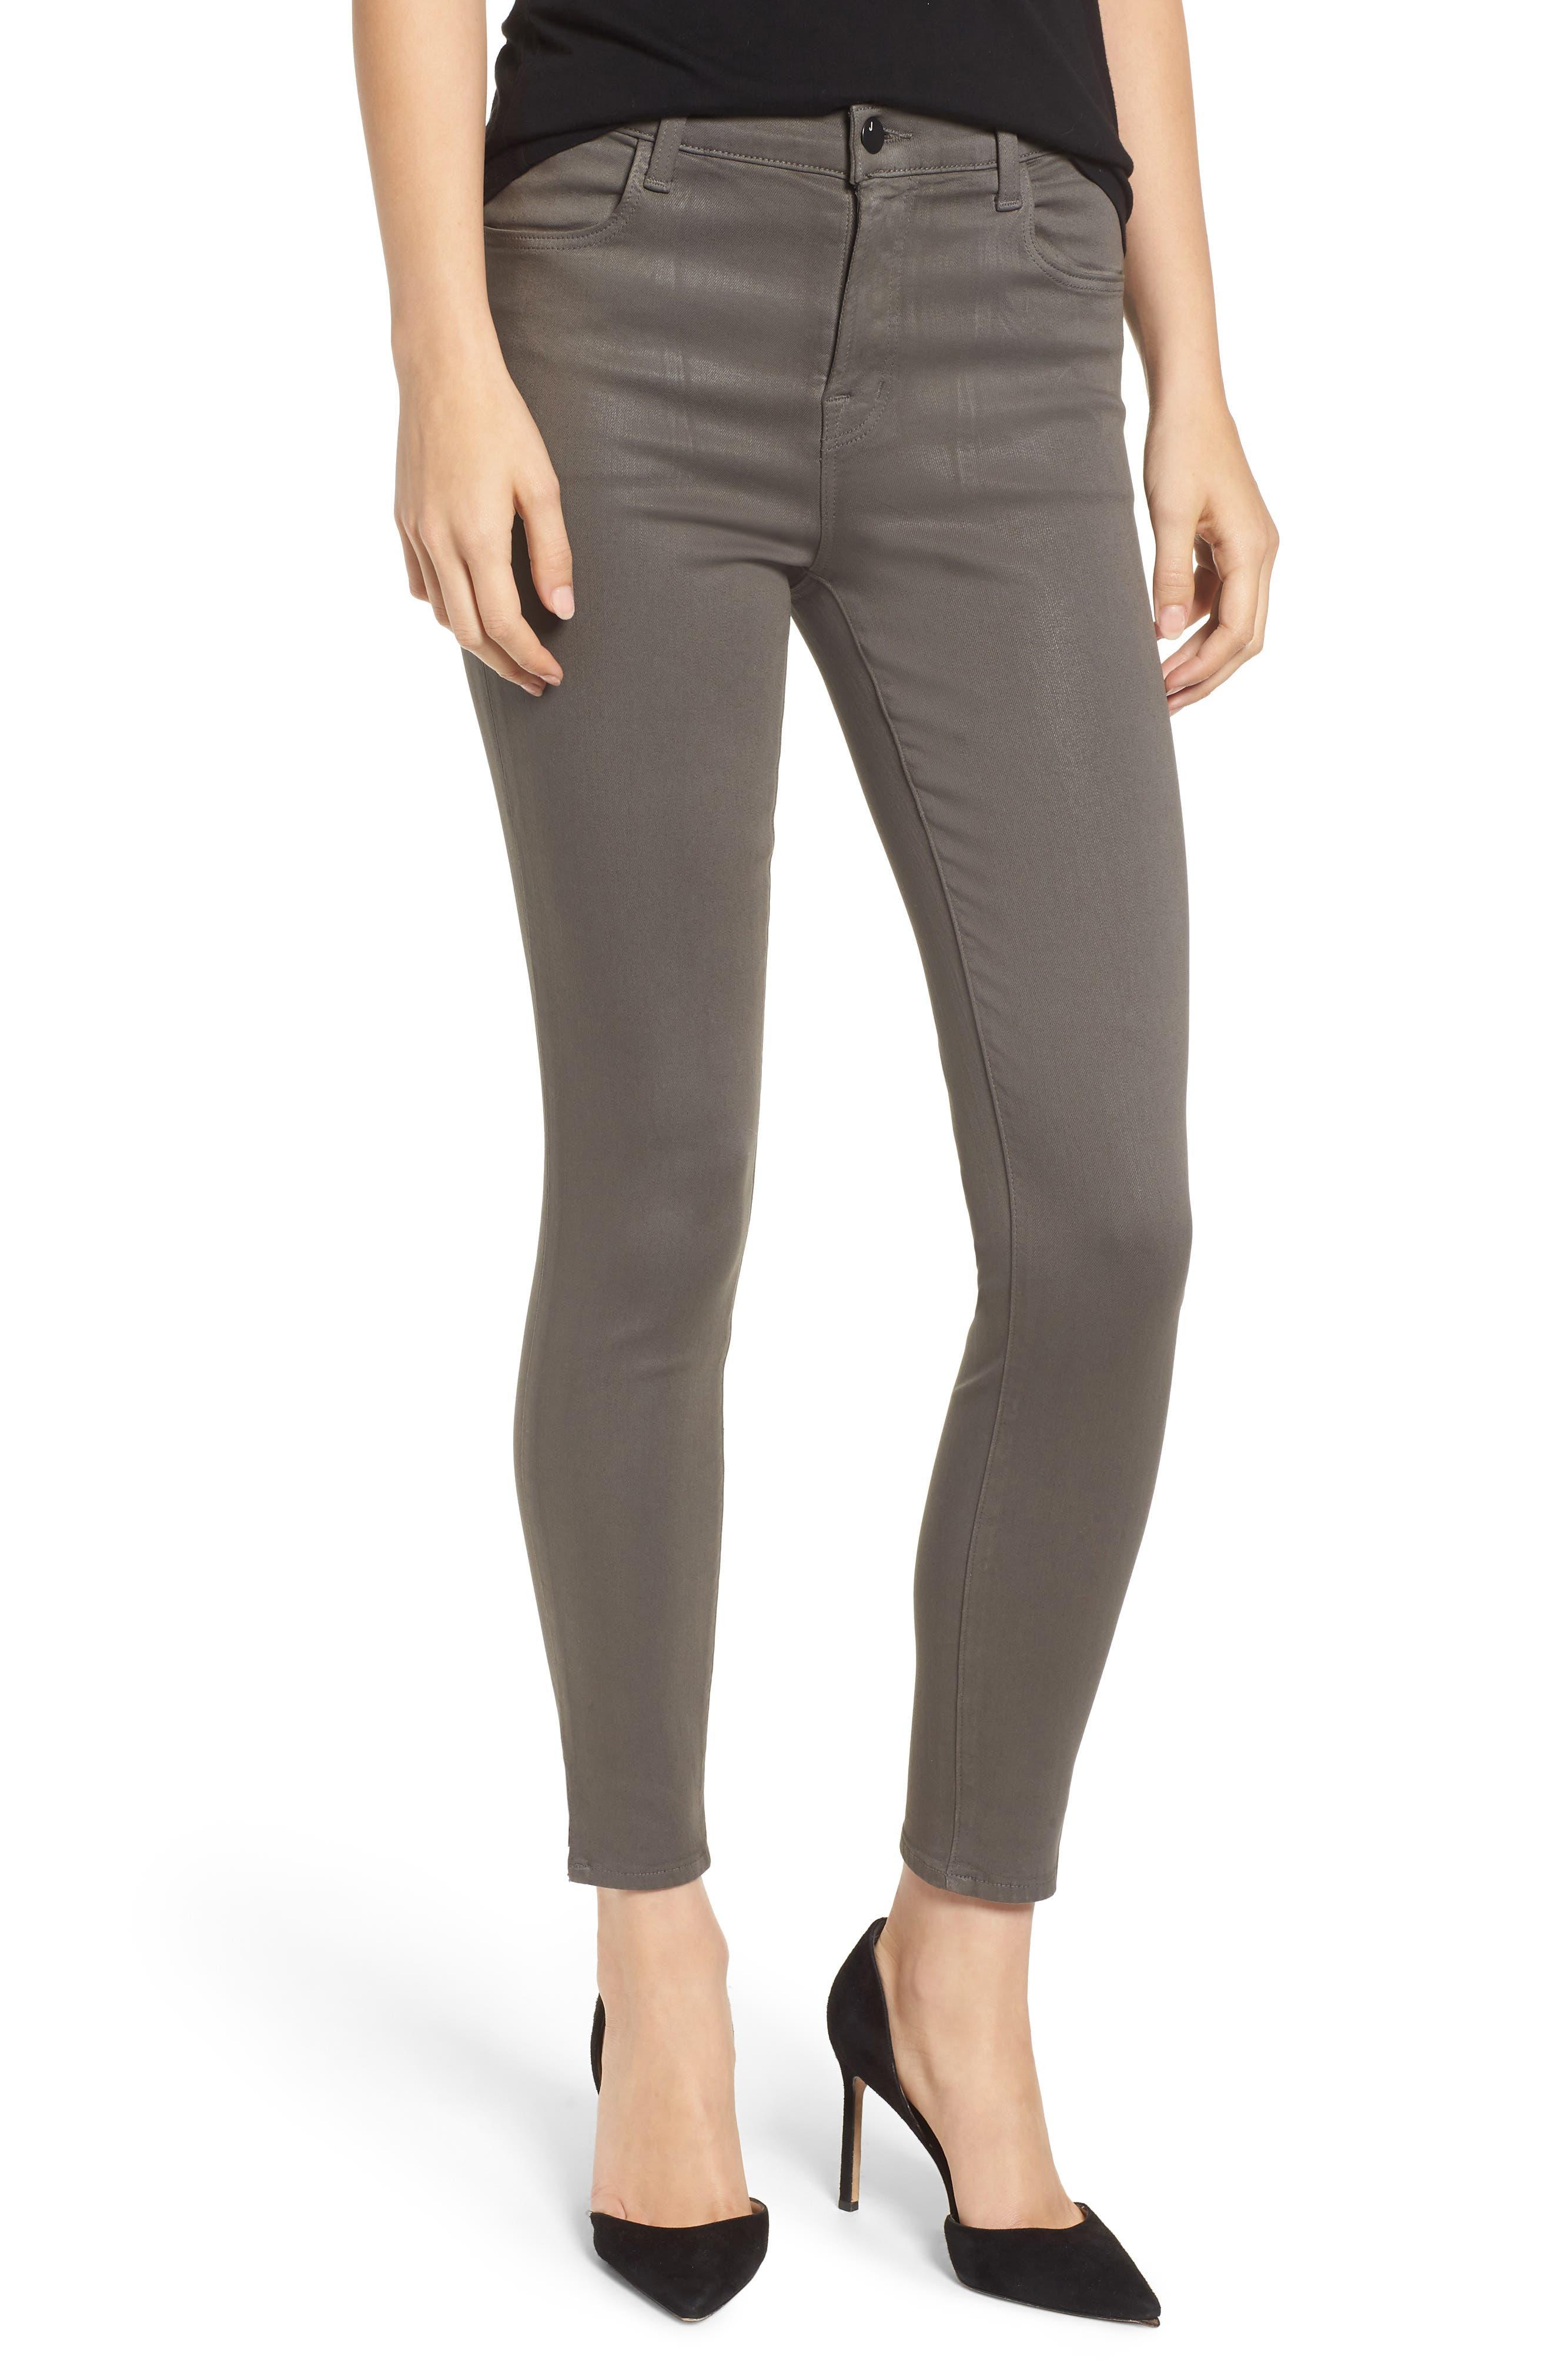 Alana High Waist Crop Skinny Jeans,                             Main thumbnail 1, color,                             COATED JUNIPER